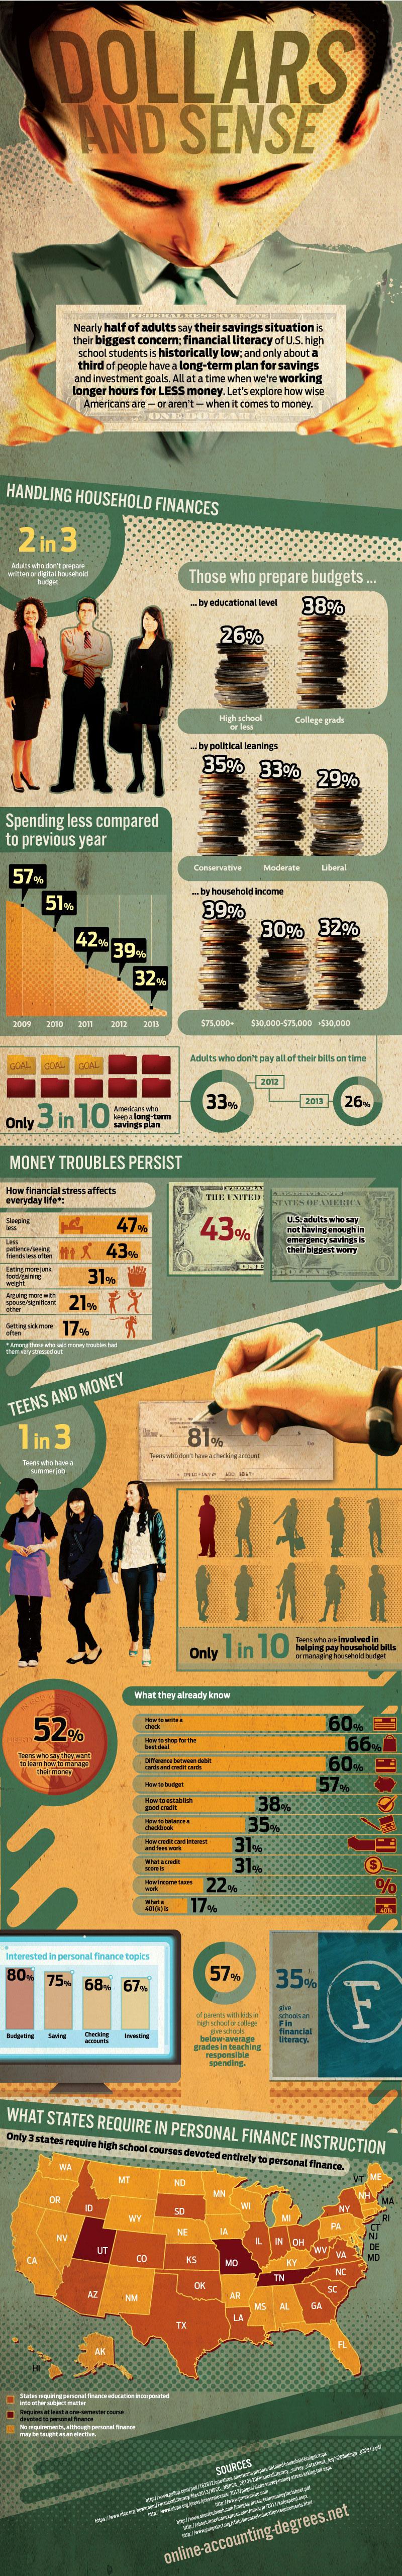 Dollars and Sense Infographic